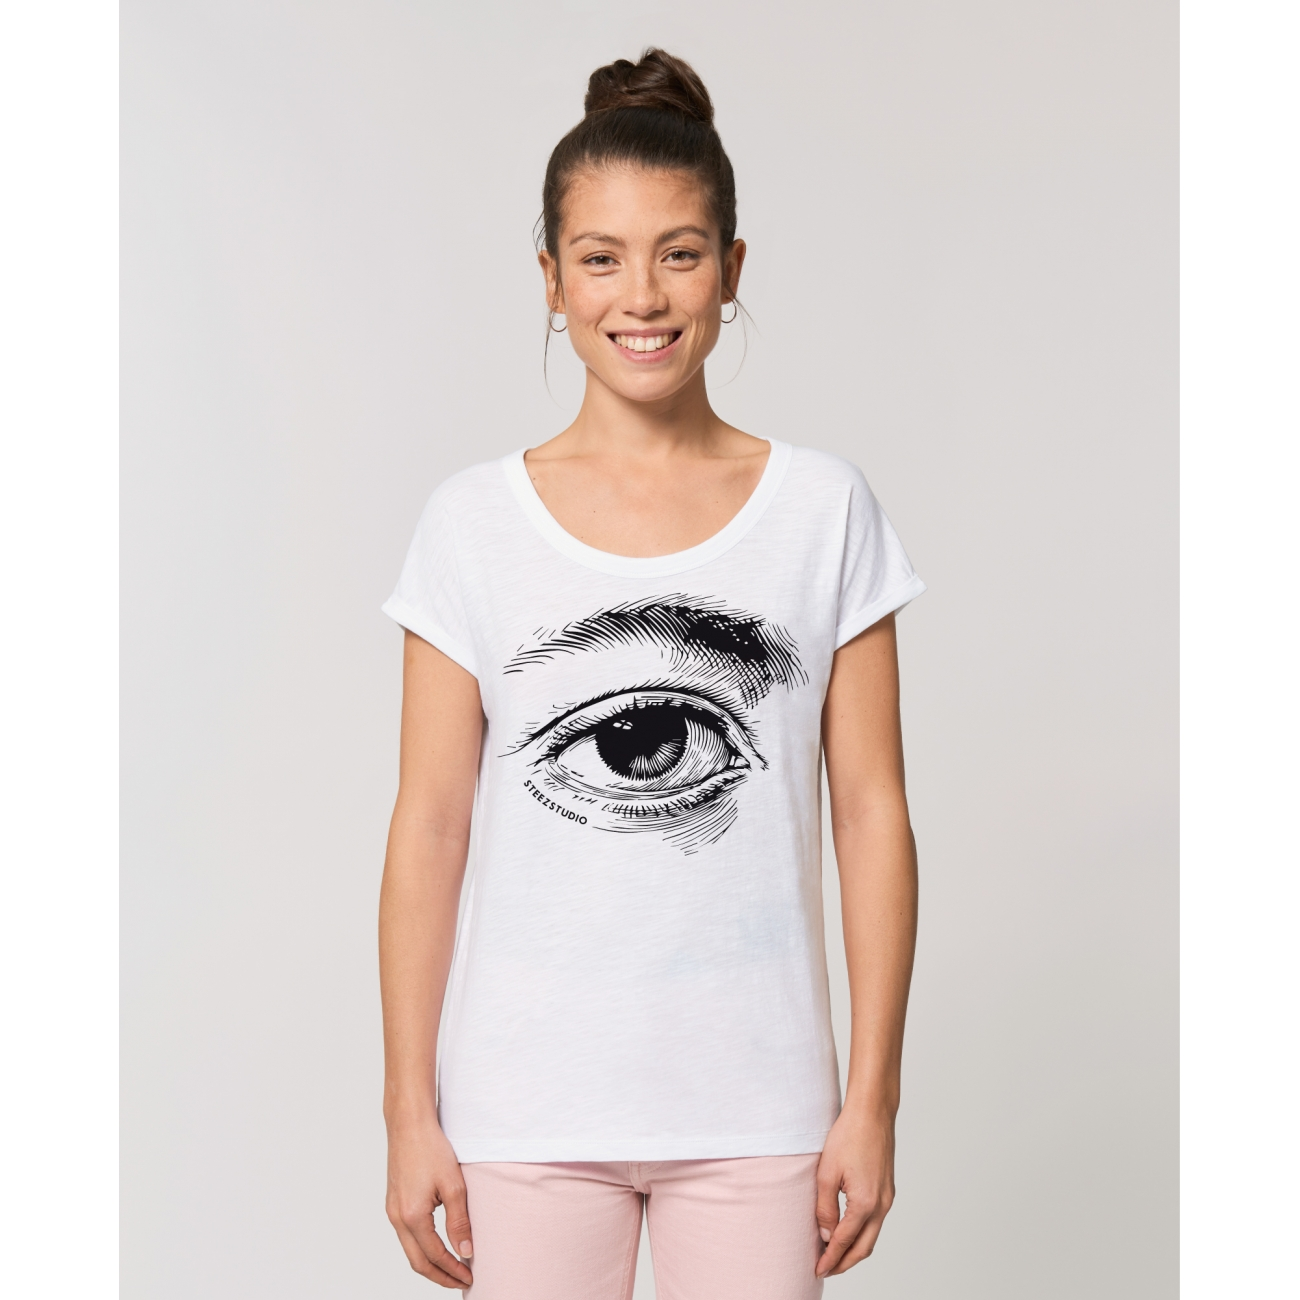 https://tee-shirt-bio.com/10479-thickbox_default/tee-shirt-blanc-femme-coton-bio-manches-repliees-impression-oeil.jpg